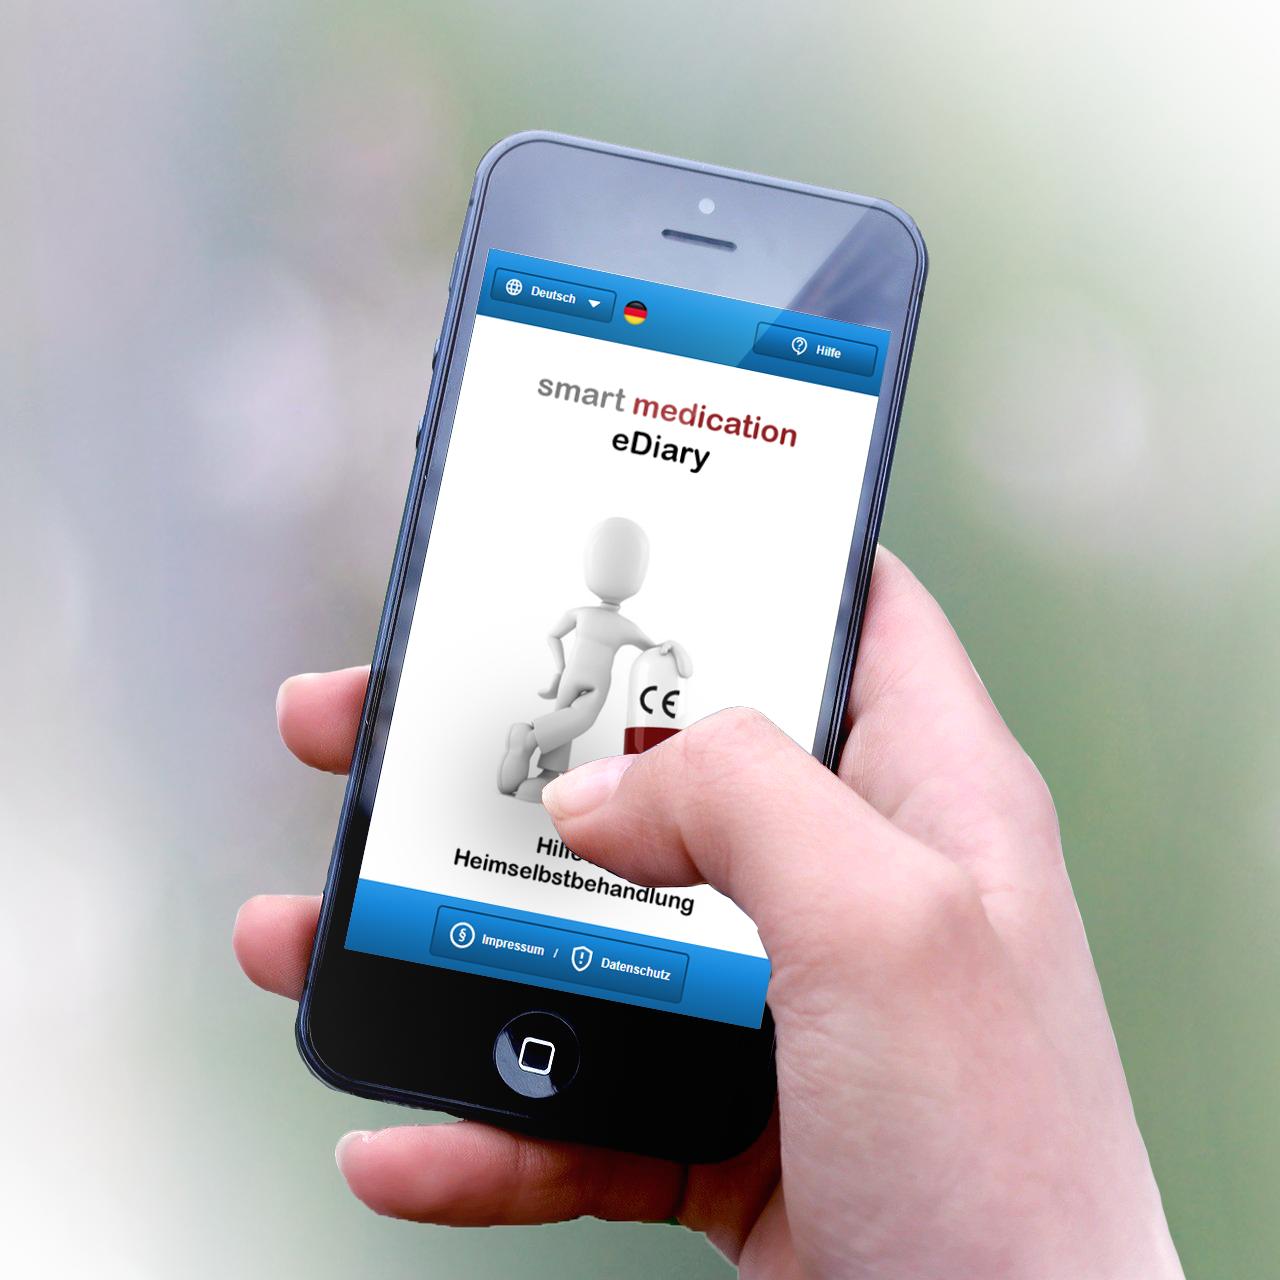 smart medication eDiary – modernes Therapiemanagement